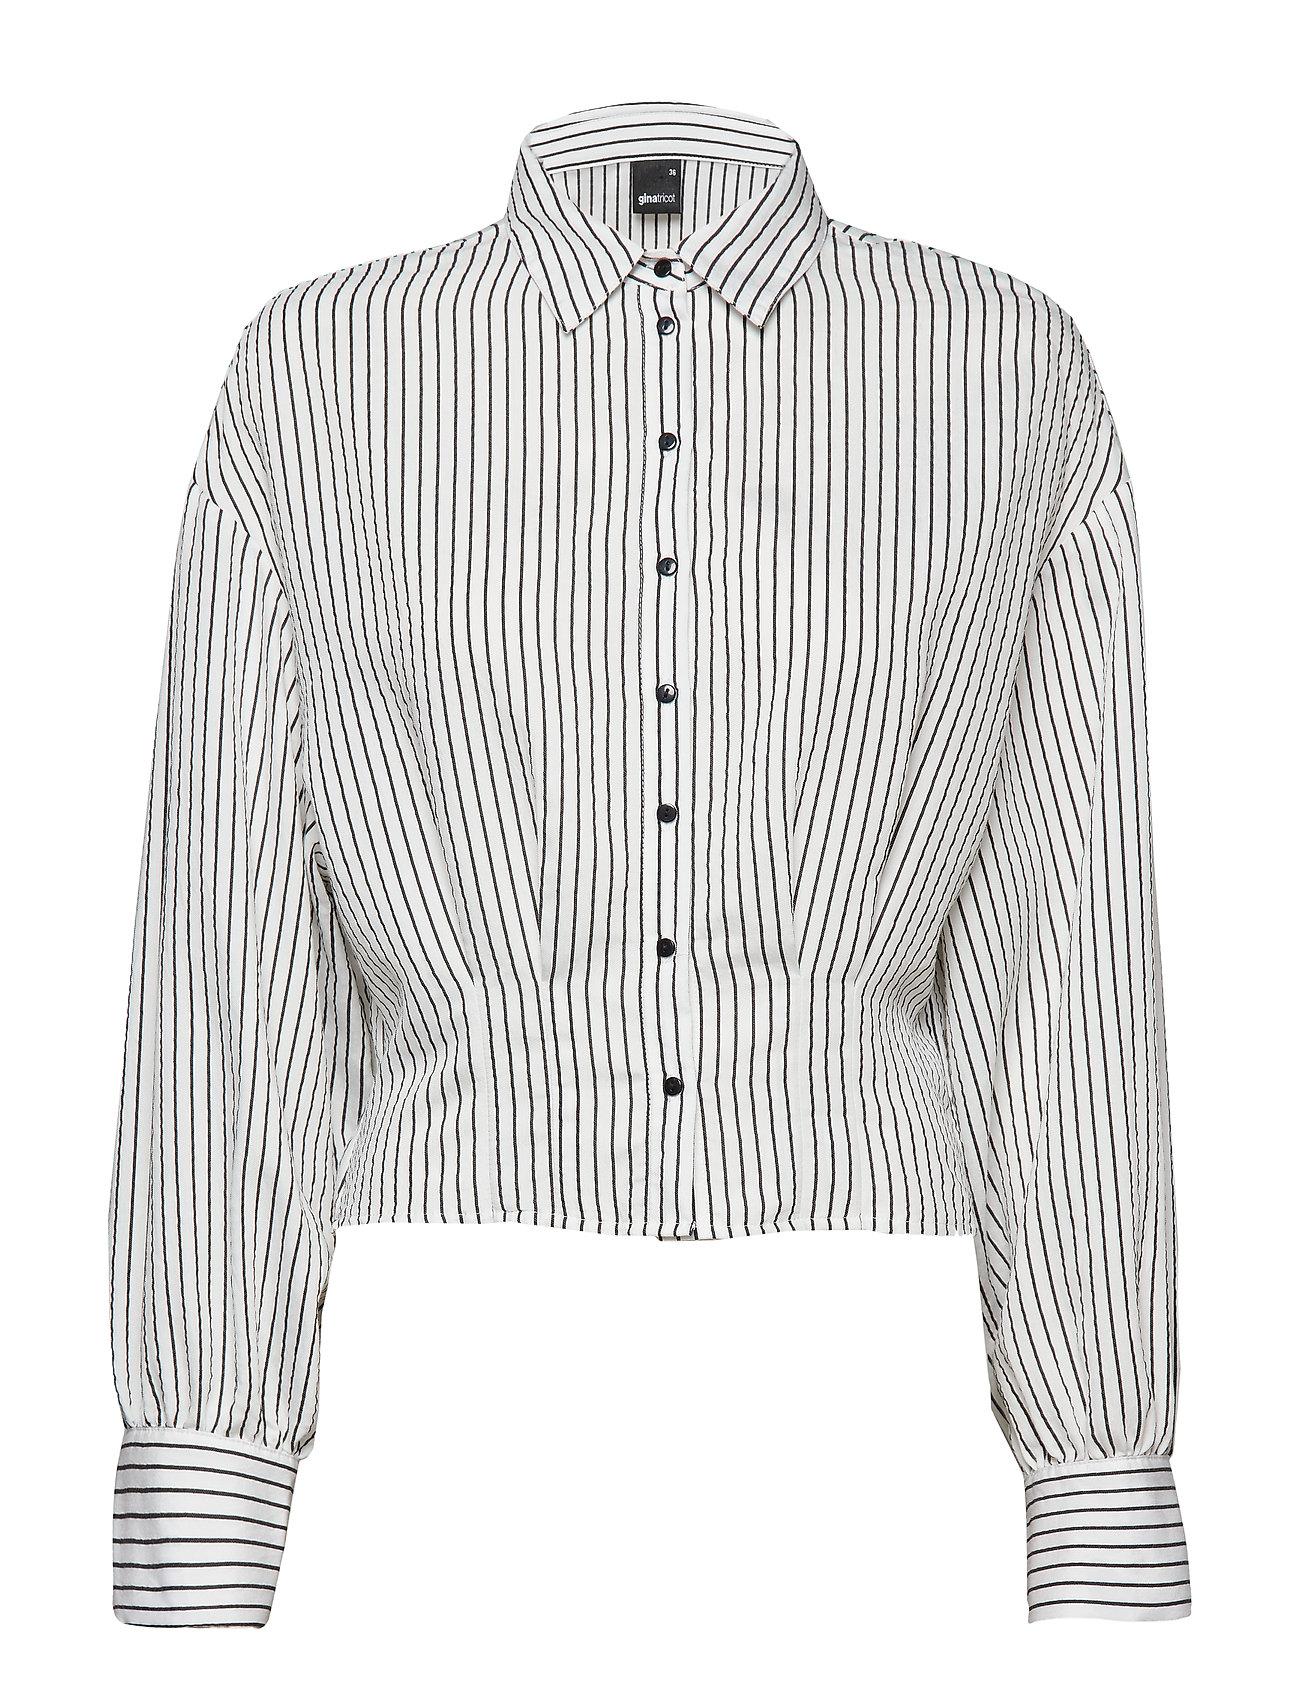 Gina Tricot Martina blouse Ögrönlar